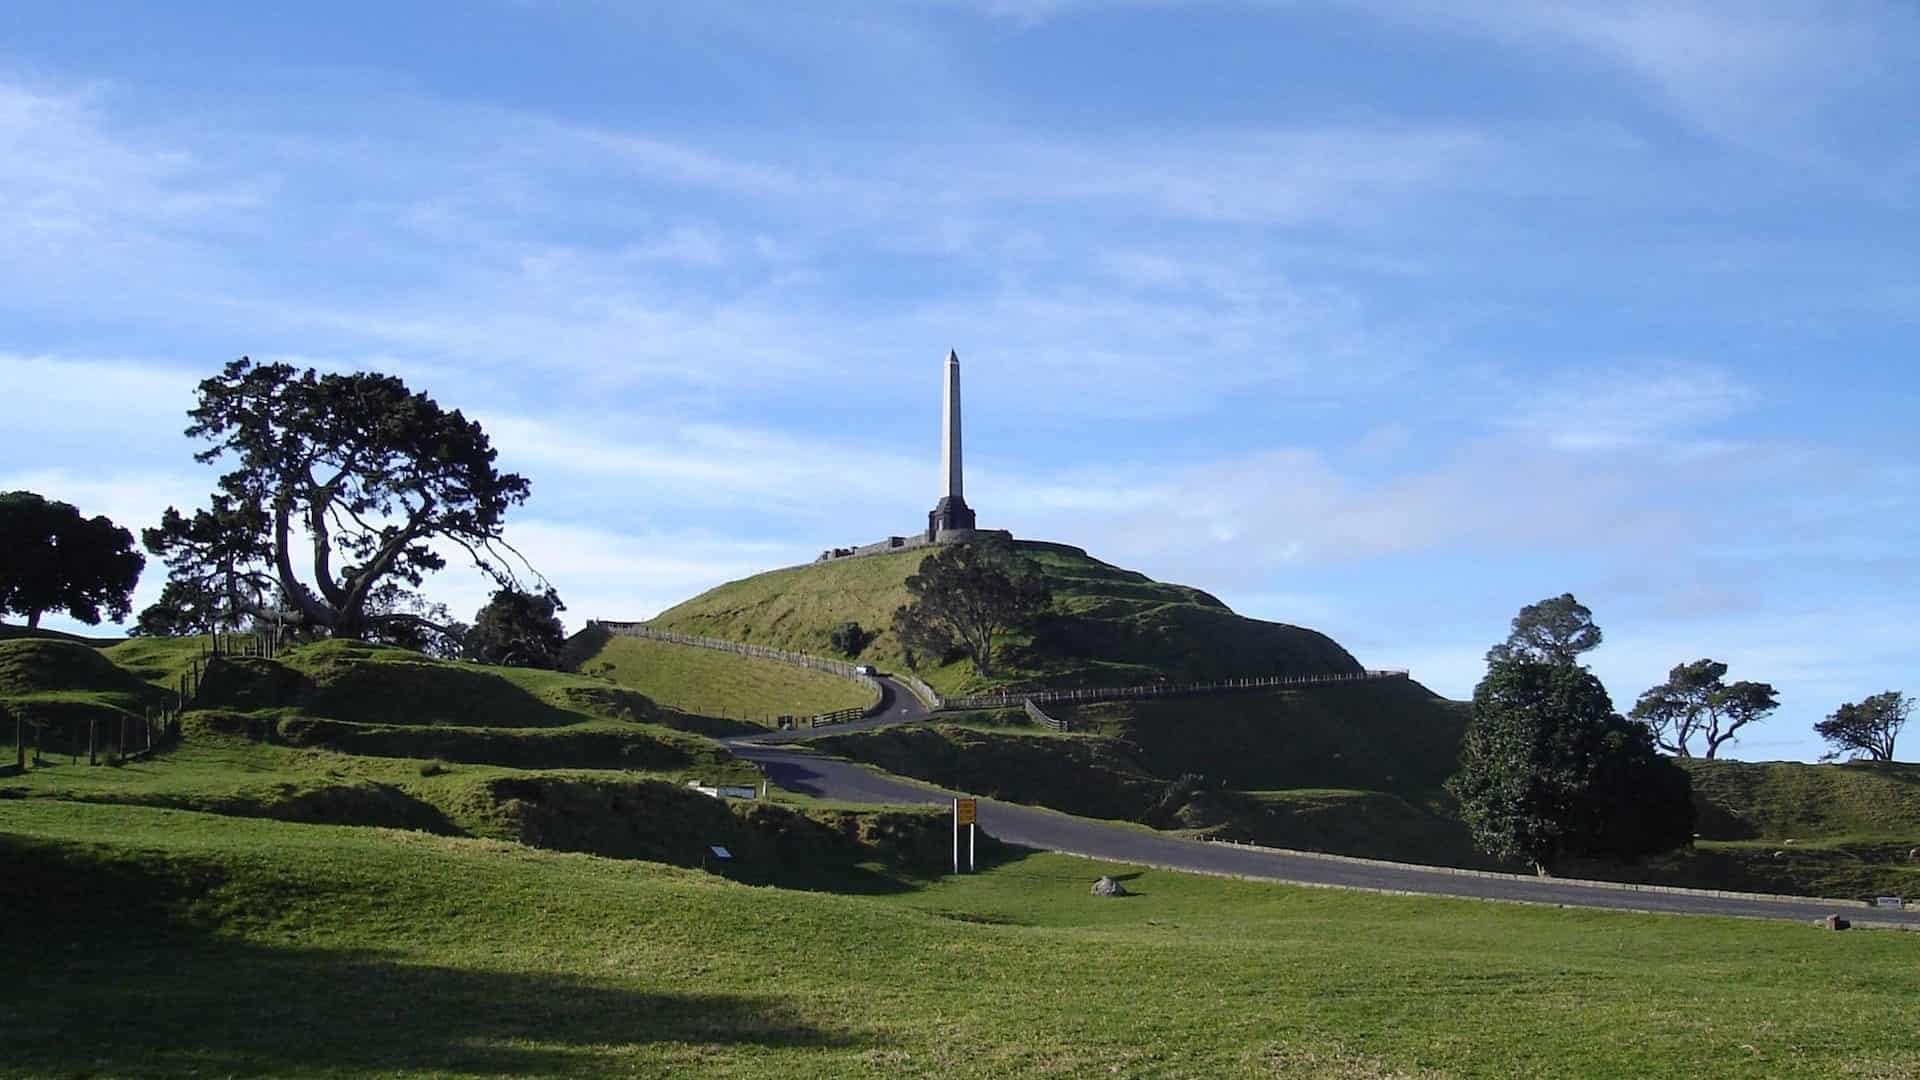 auckland_one_tree_hill_bg_wiki